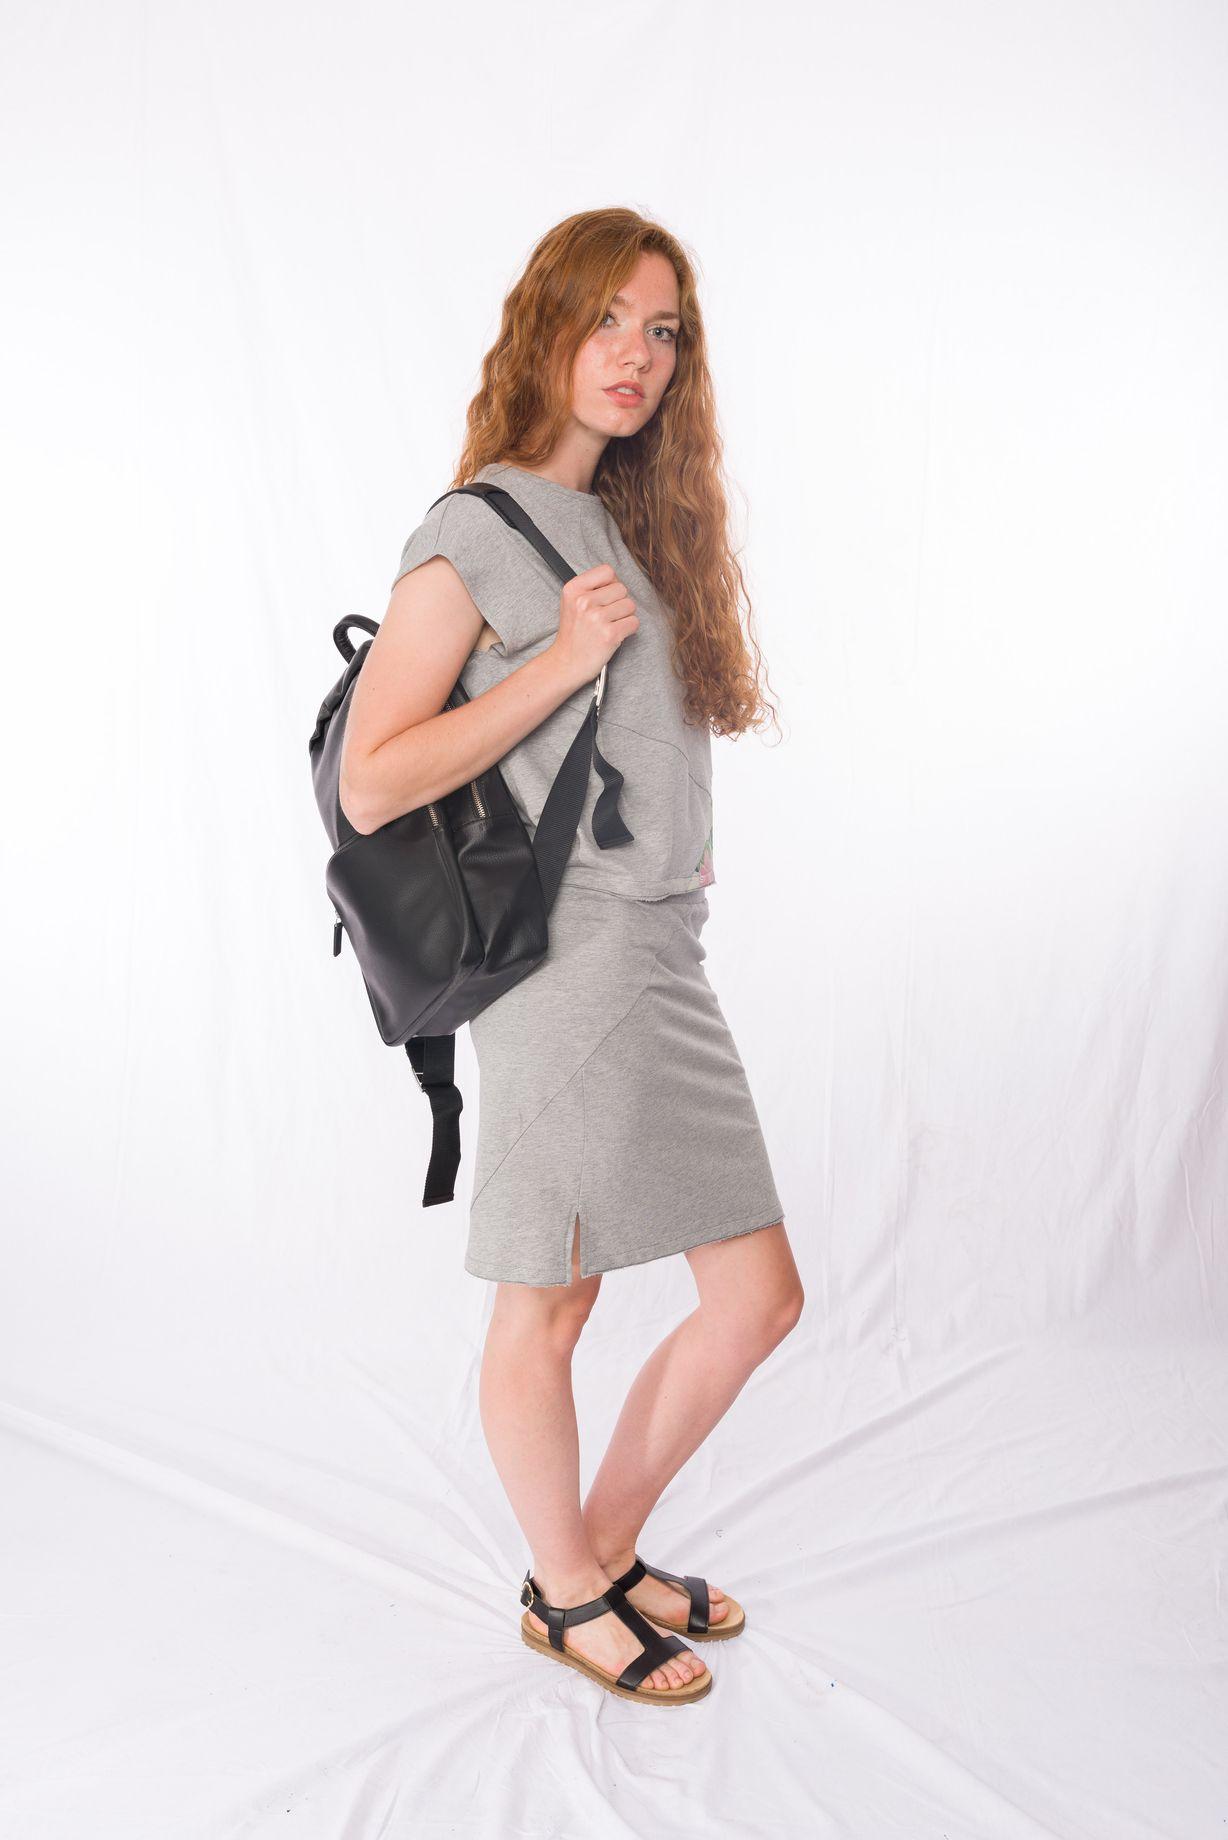 Sweat-Tshirt Shorty Tropic _ Sweat-Rock Grey _ Backpack